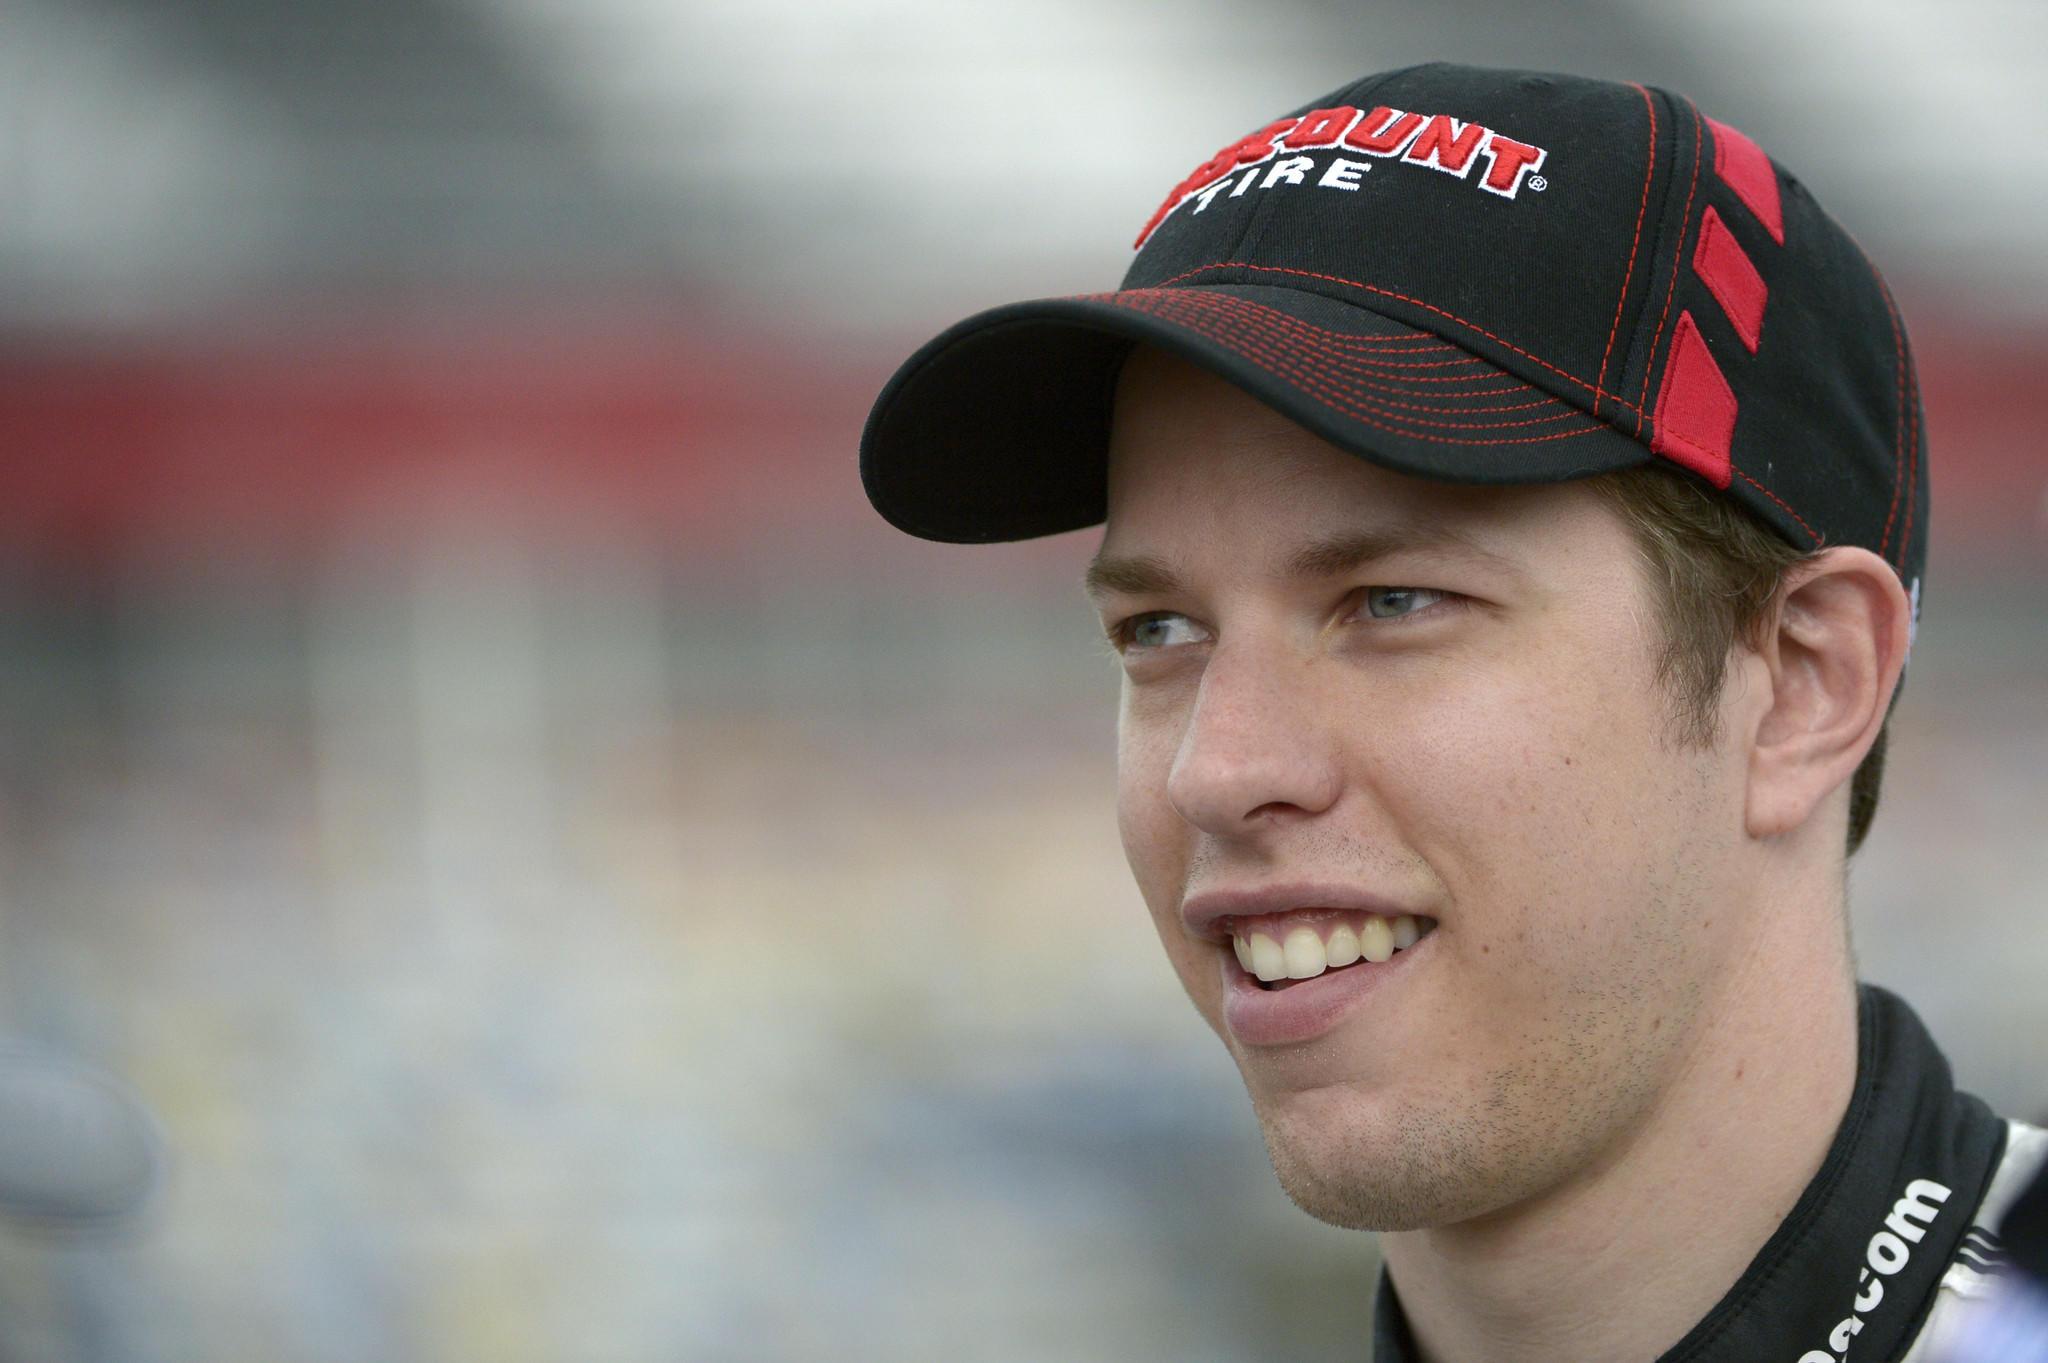 Brad Keselowski has his own ideas for a NASCAR schedule.